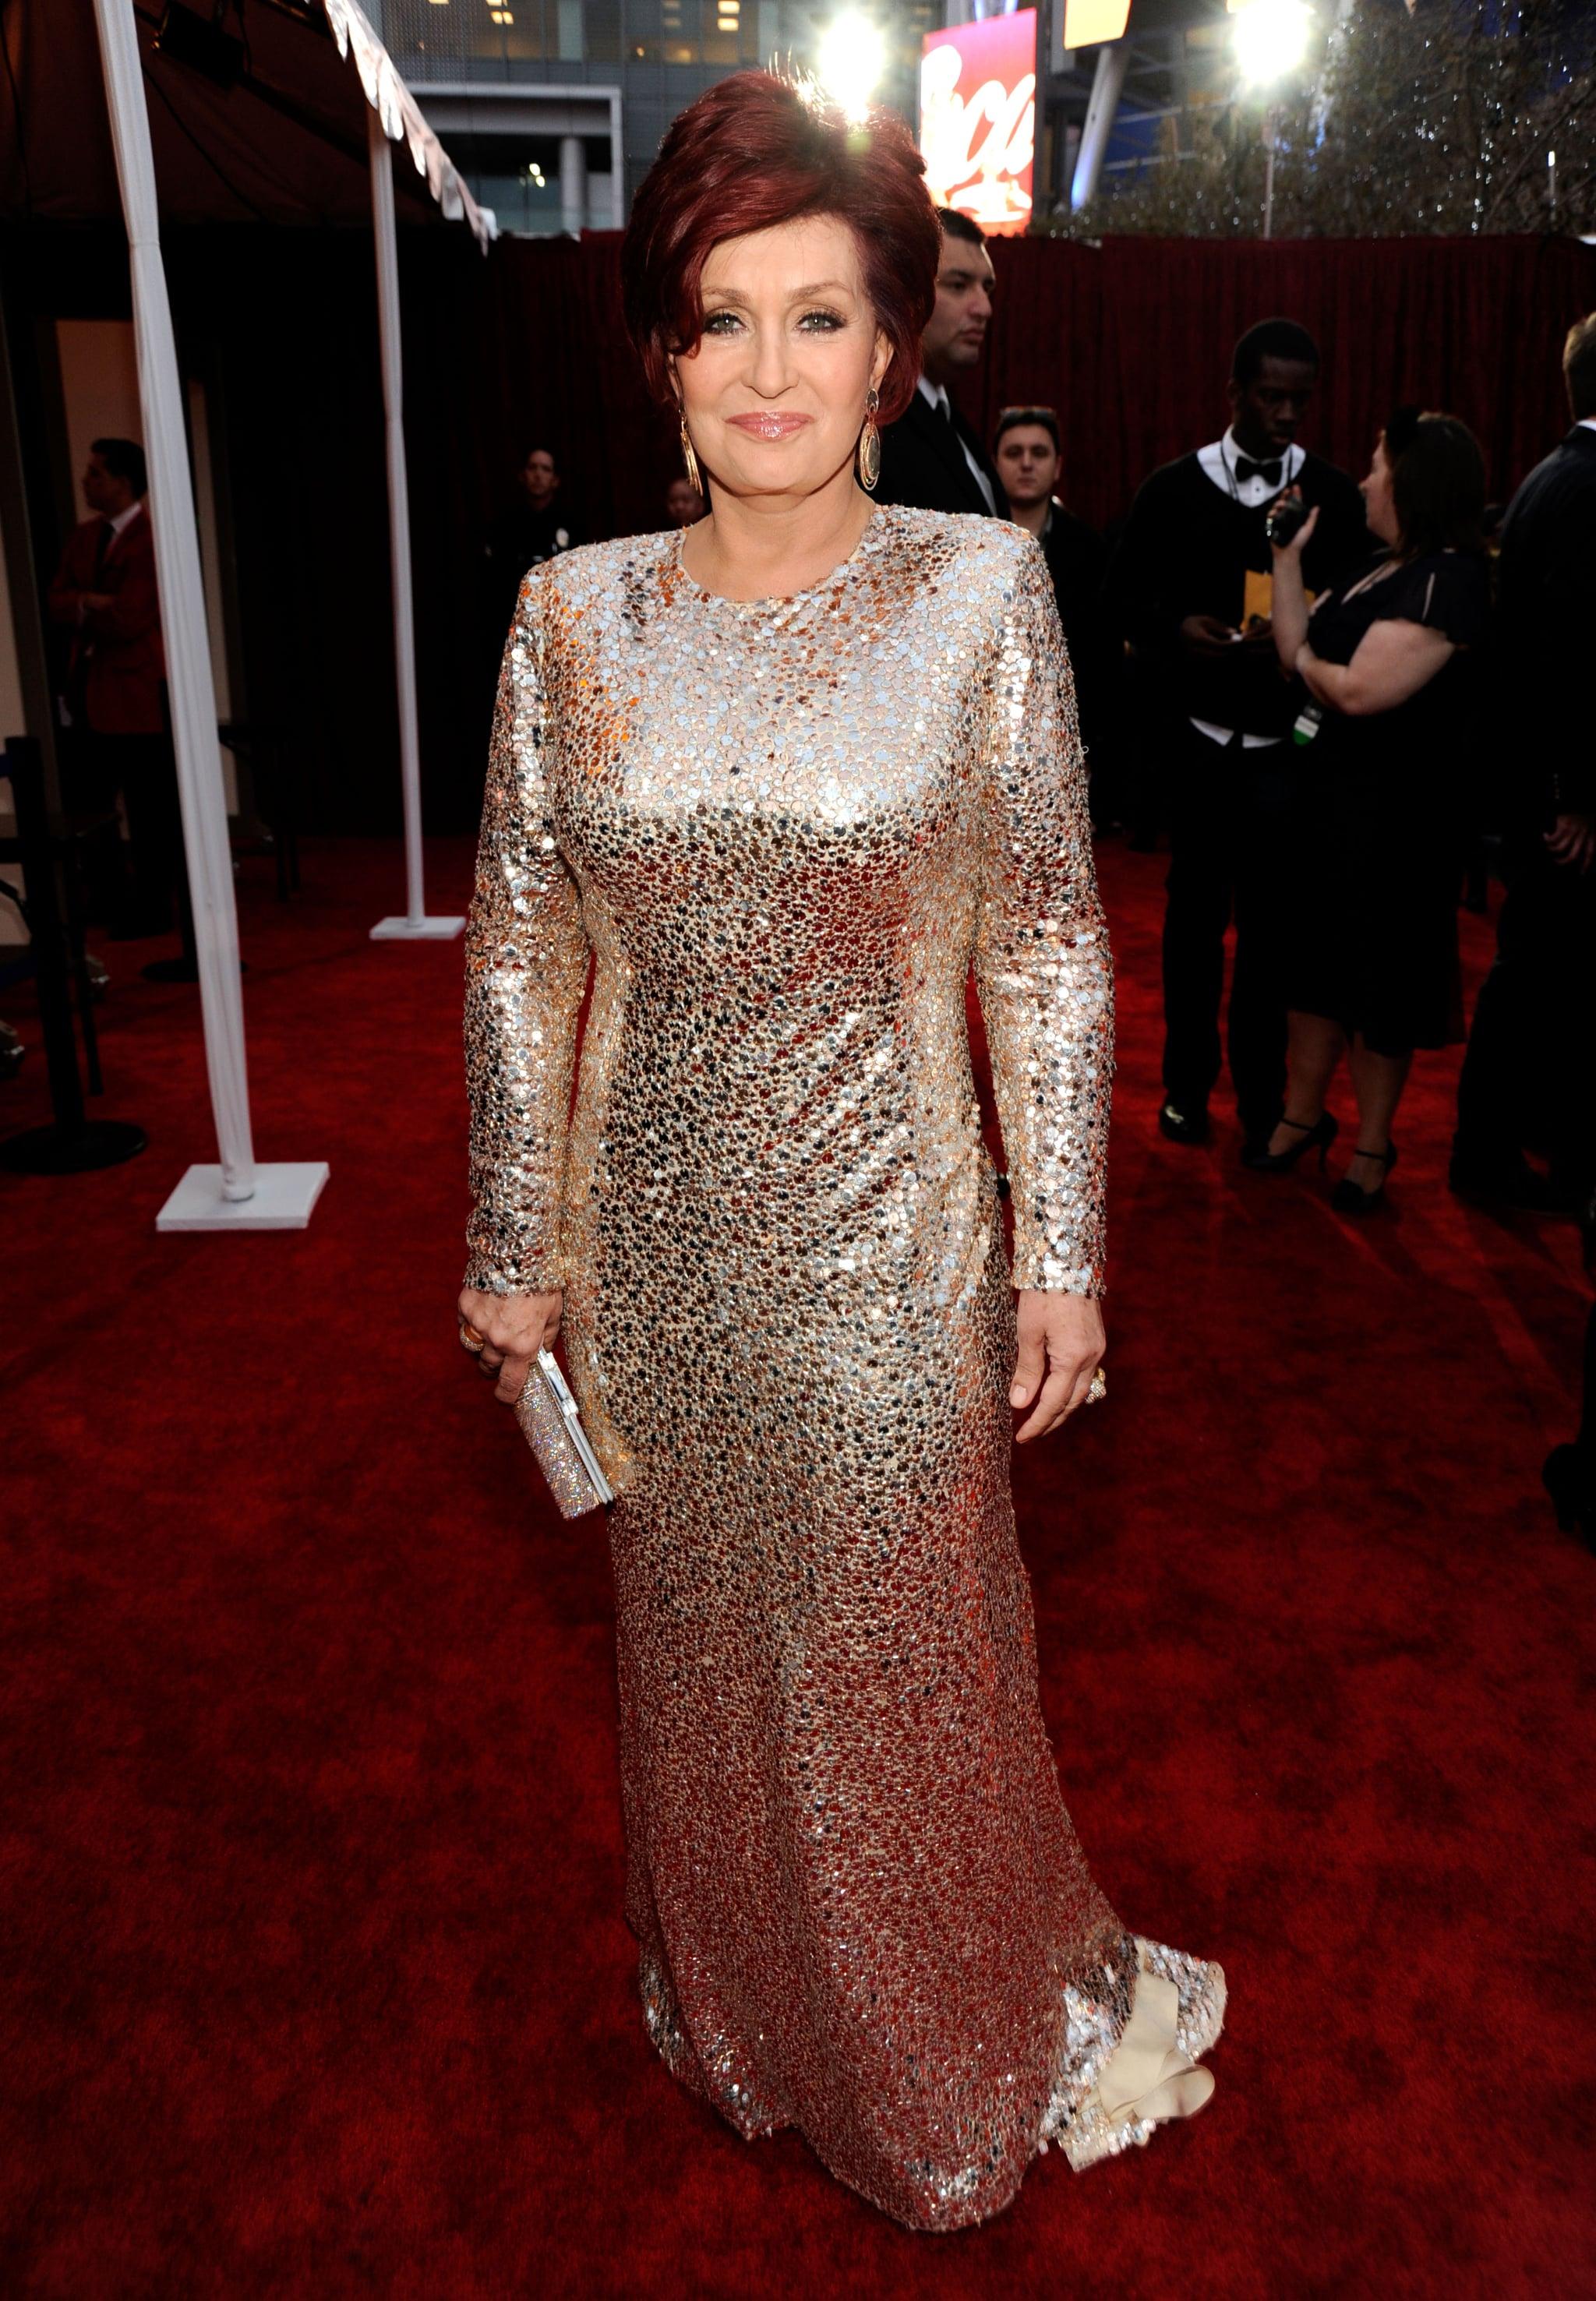 Sharon Osbourne in a glittery dress.